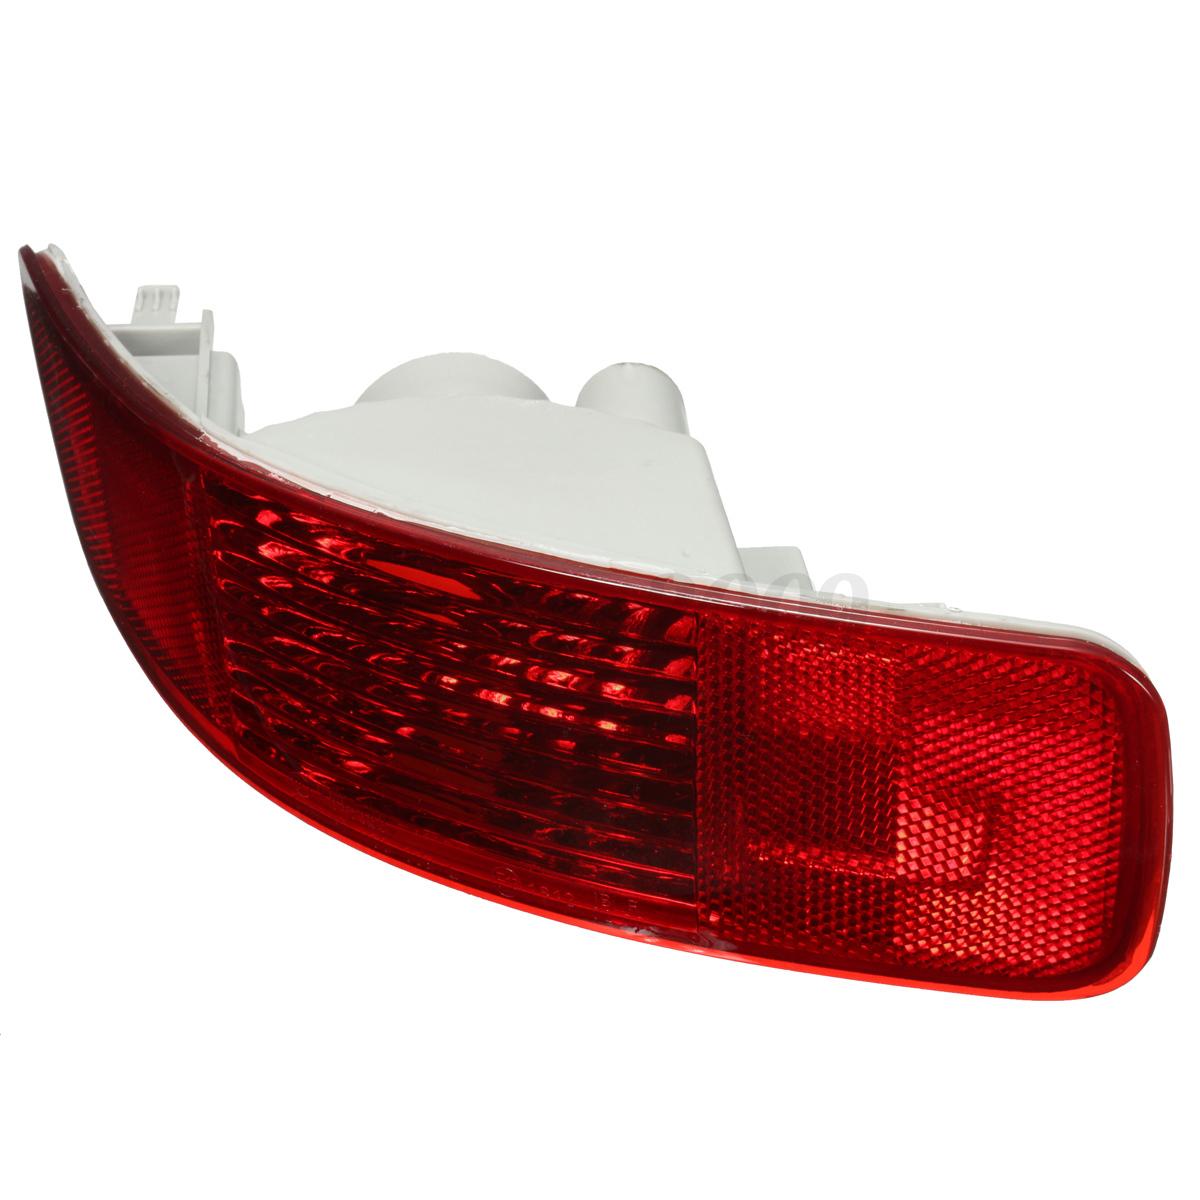 OEM Rear Fog lamp Light  Imitation right side RH Mitsubishi  Outlander 2007-2013